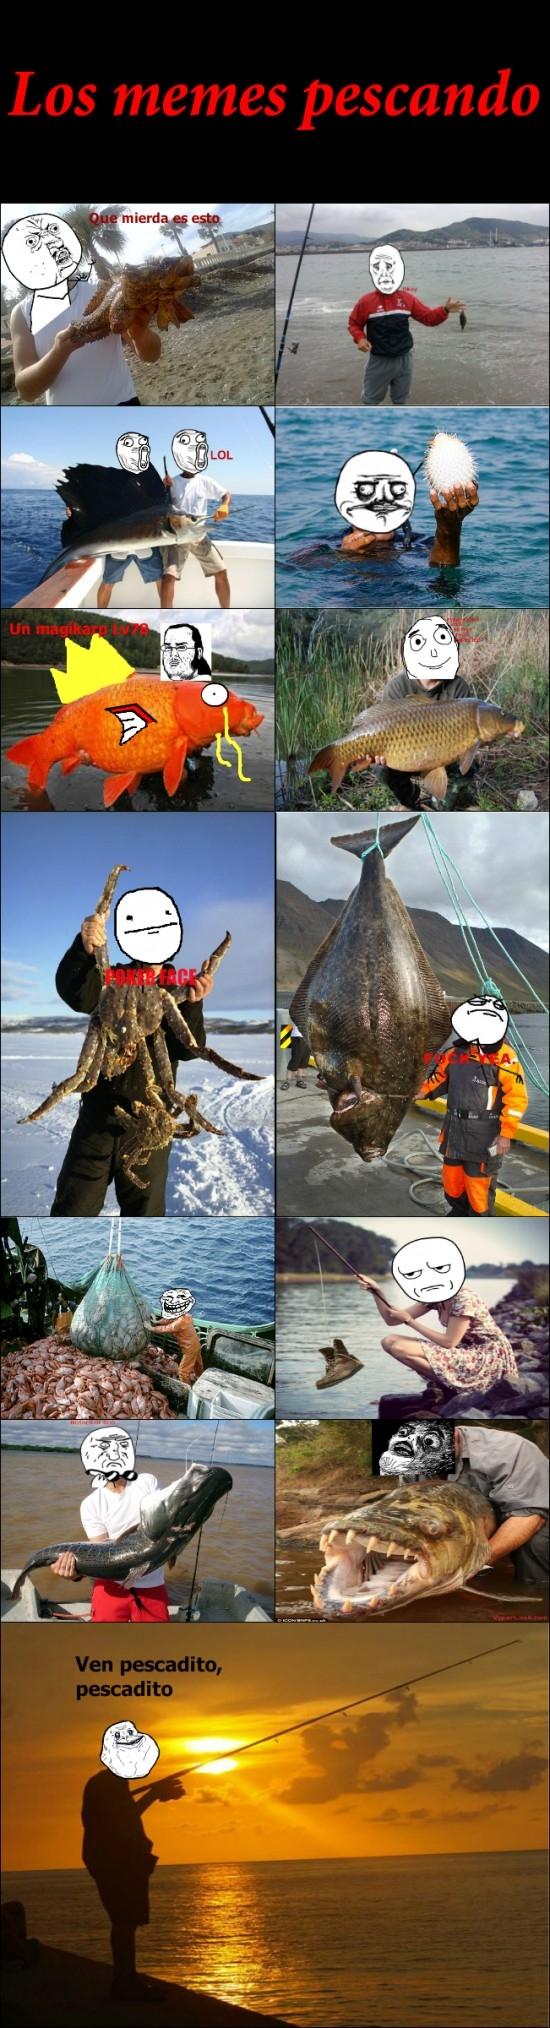 forever alone,lol,oh god why,peces,pescadores,pescando,raisins,trollface